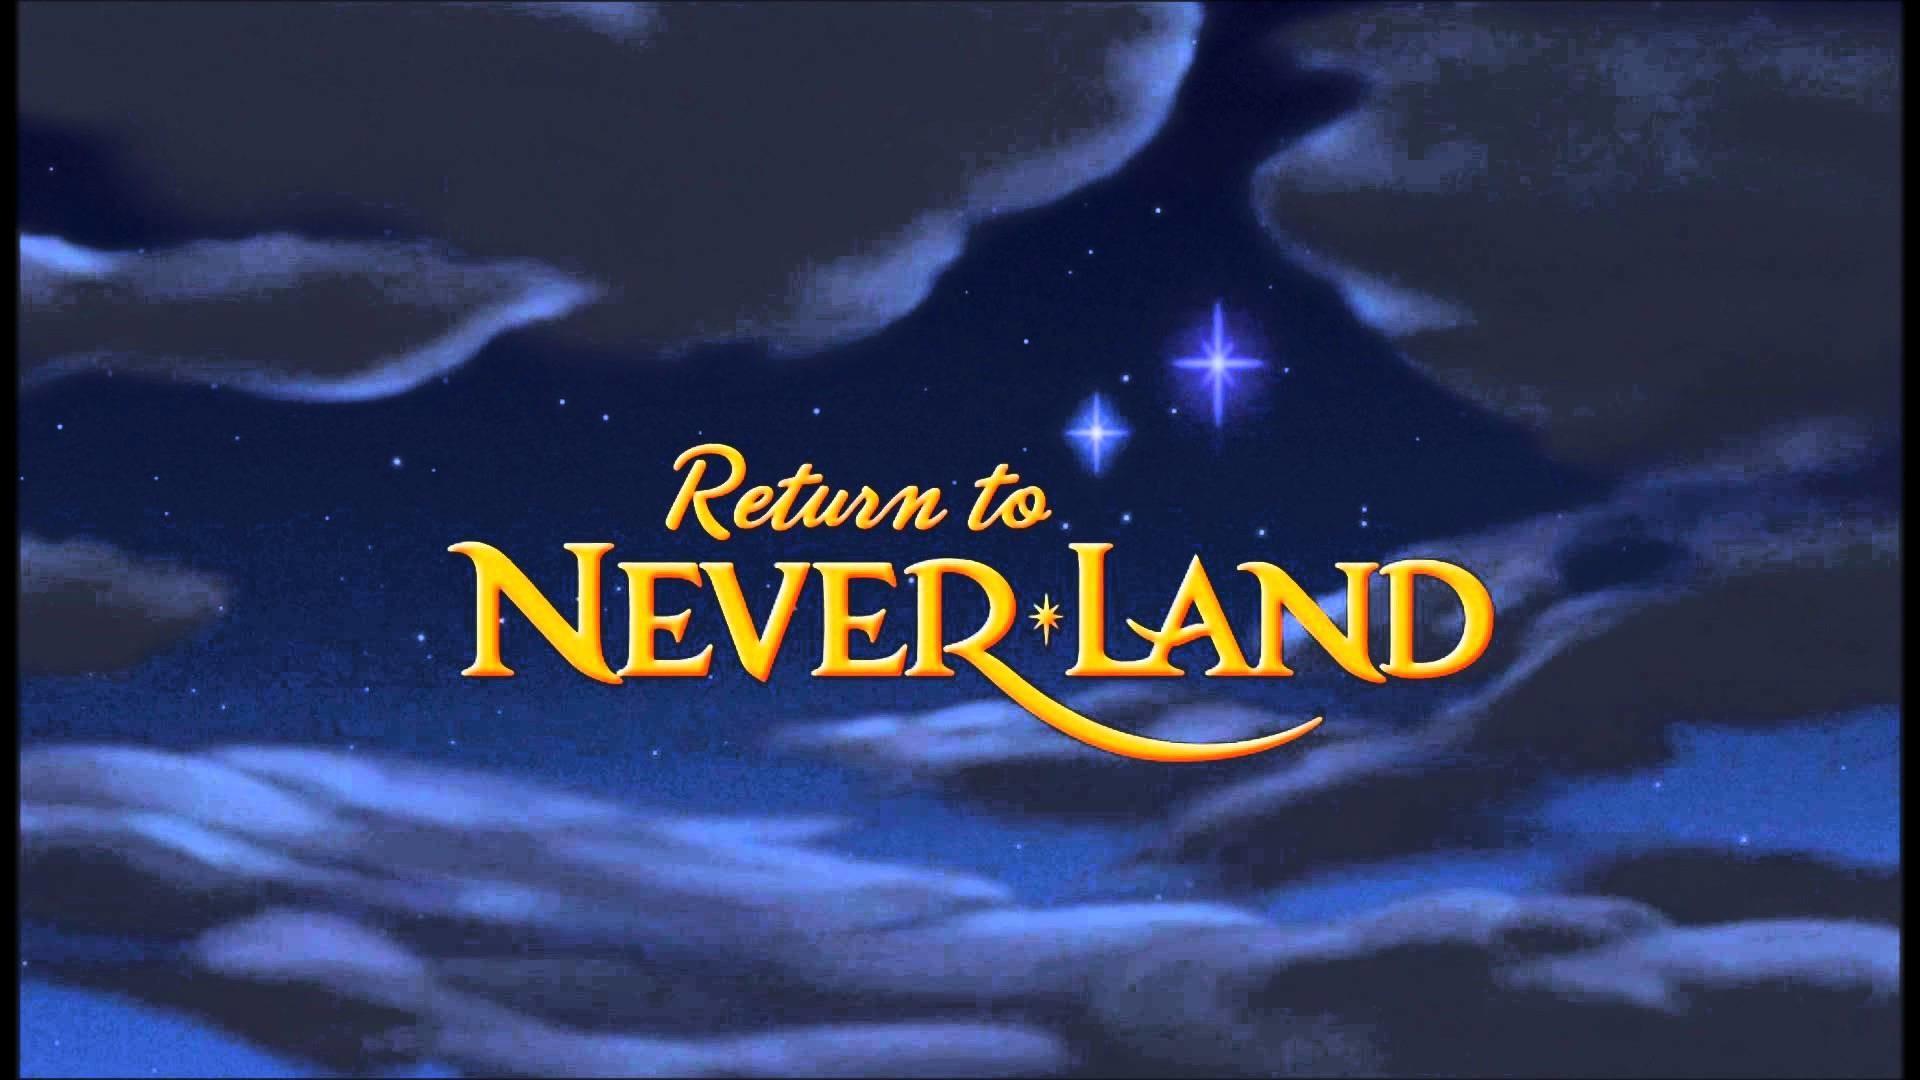 Disney World Wallpaper Iphone 6 Neverland Wallpaper 66 Pictures